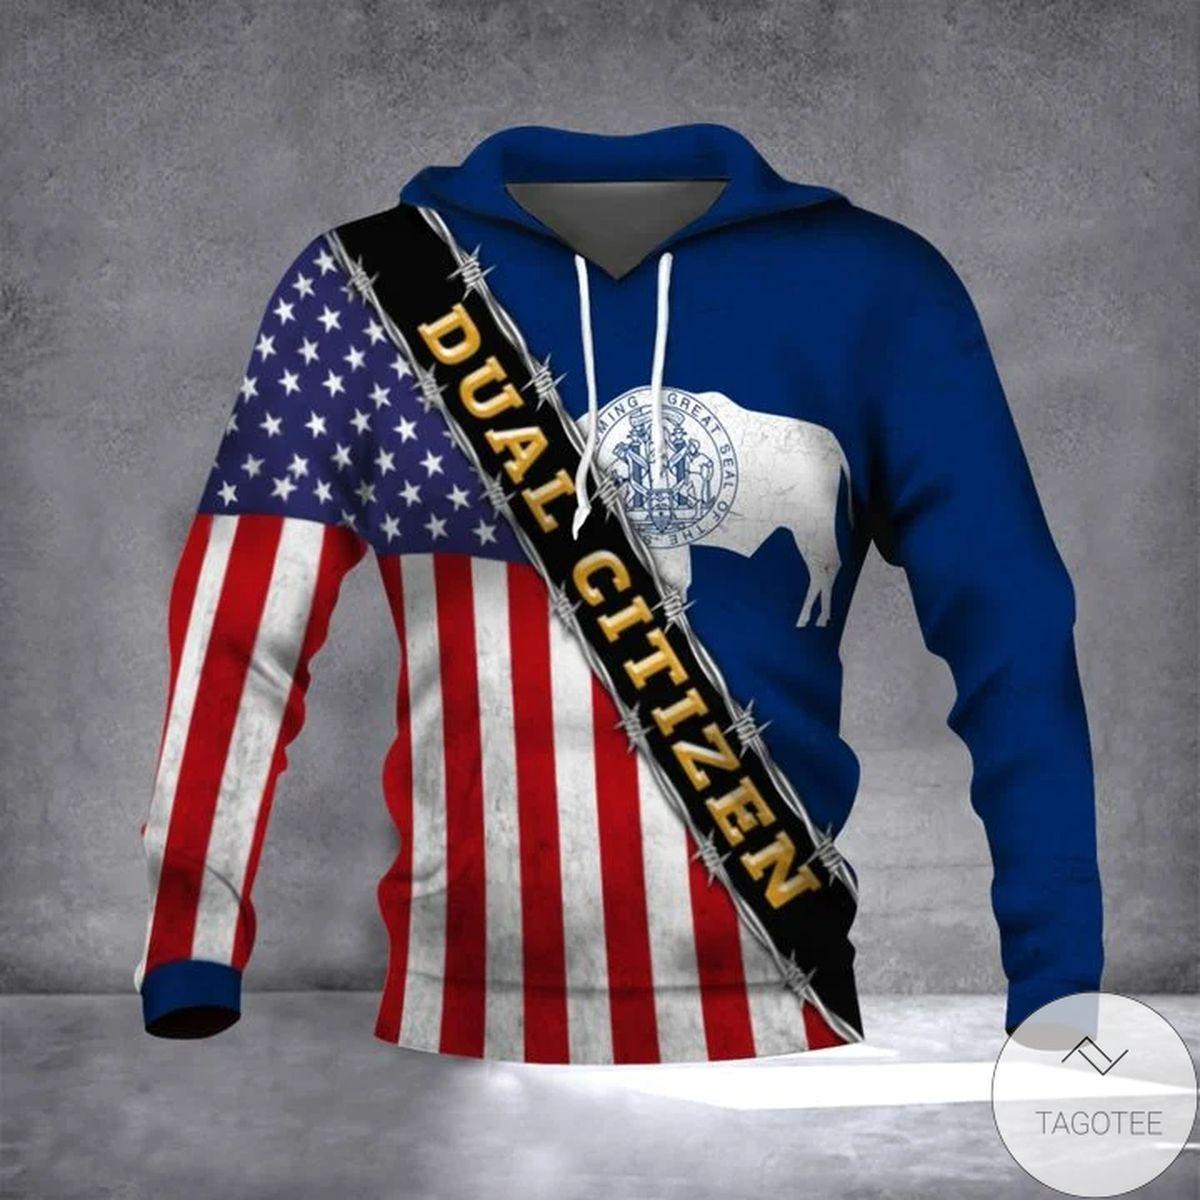 Wyoming Dual Citizen American Wyoming State Flag Hoodie